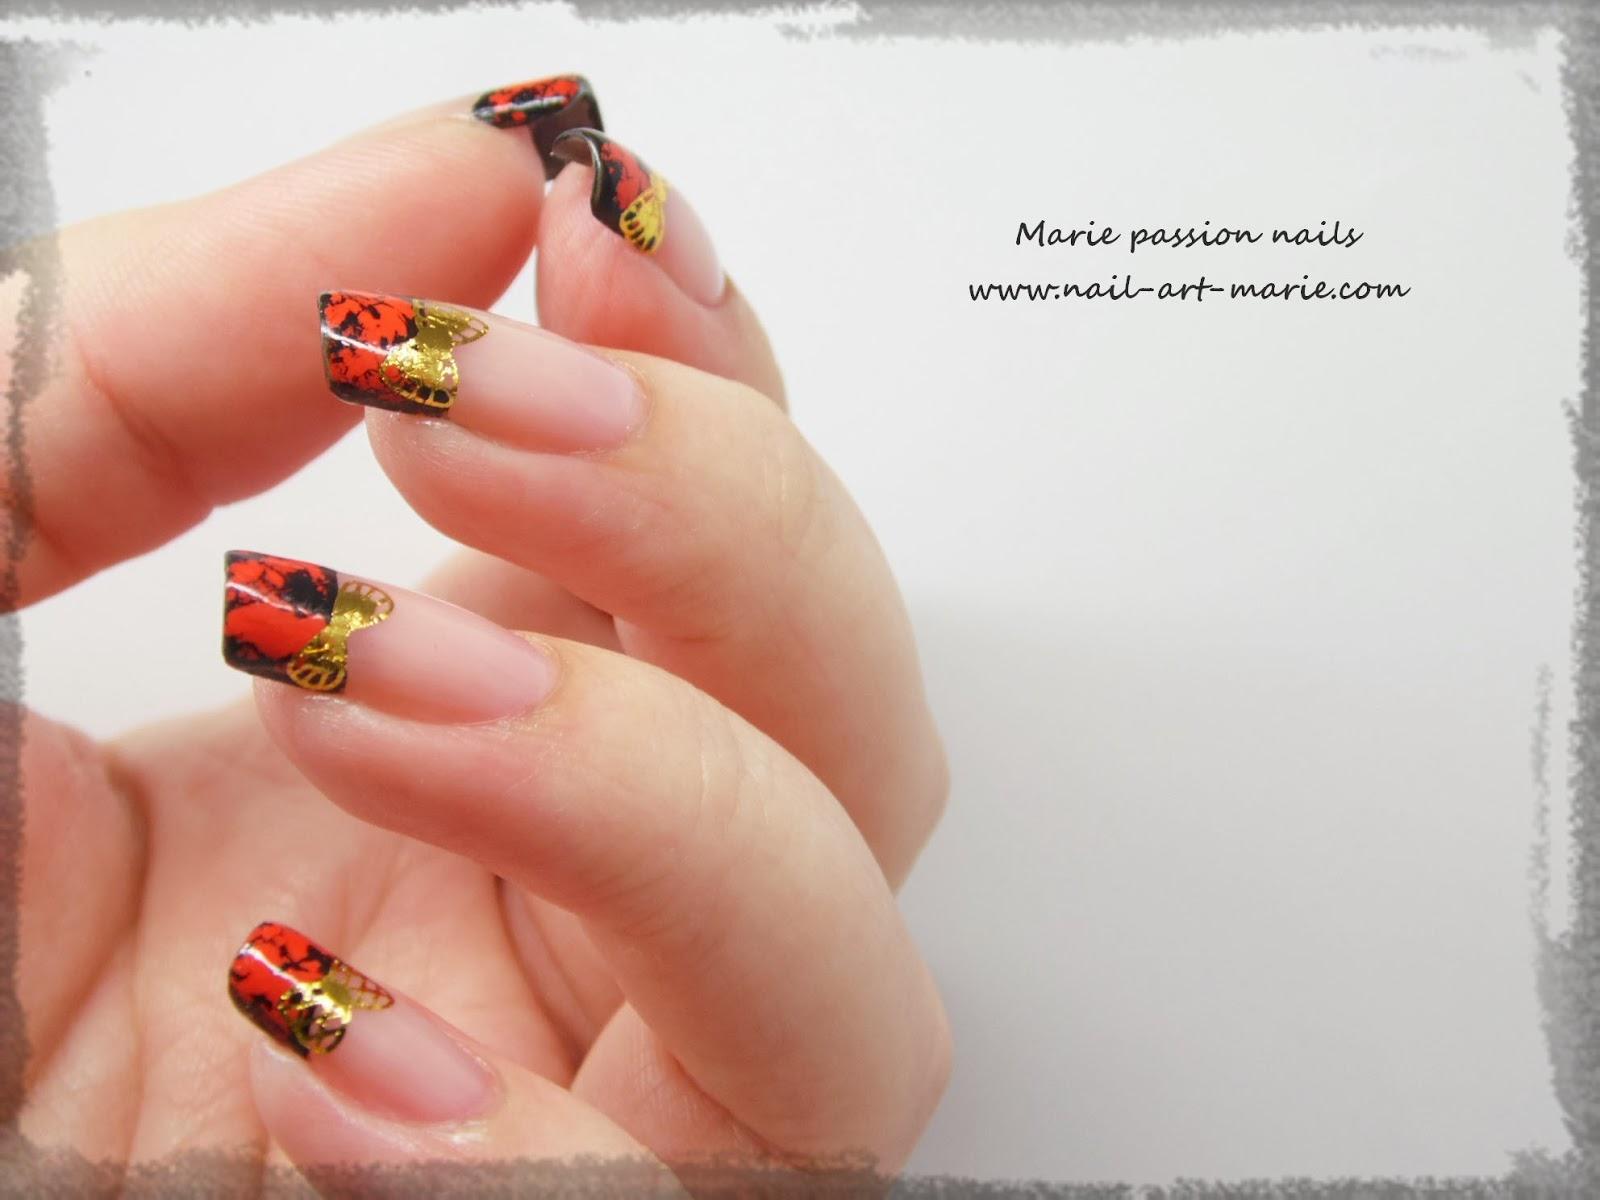 Nail Art avec craquelures de foils matte6